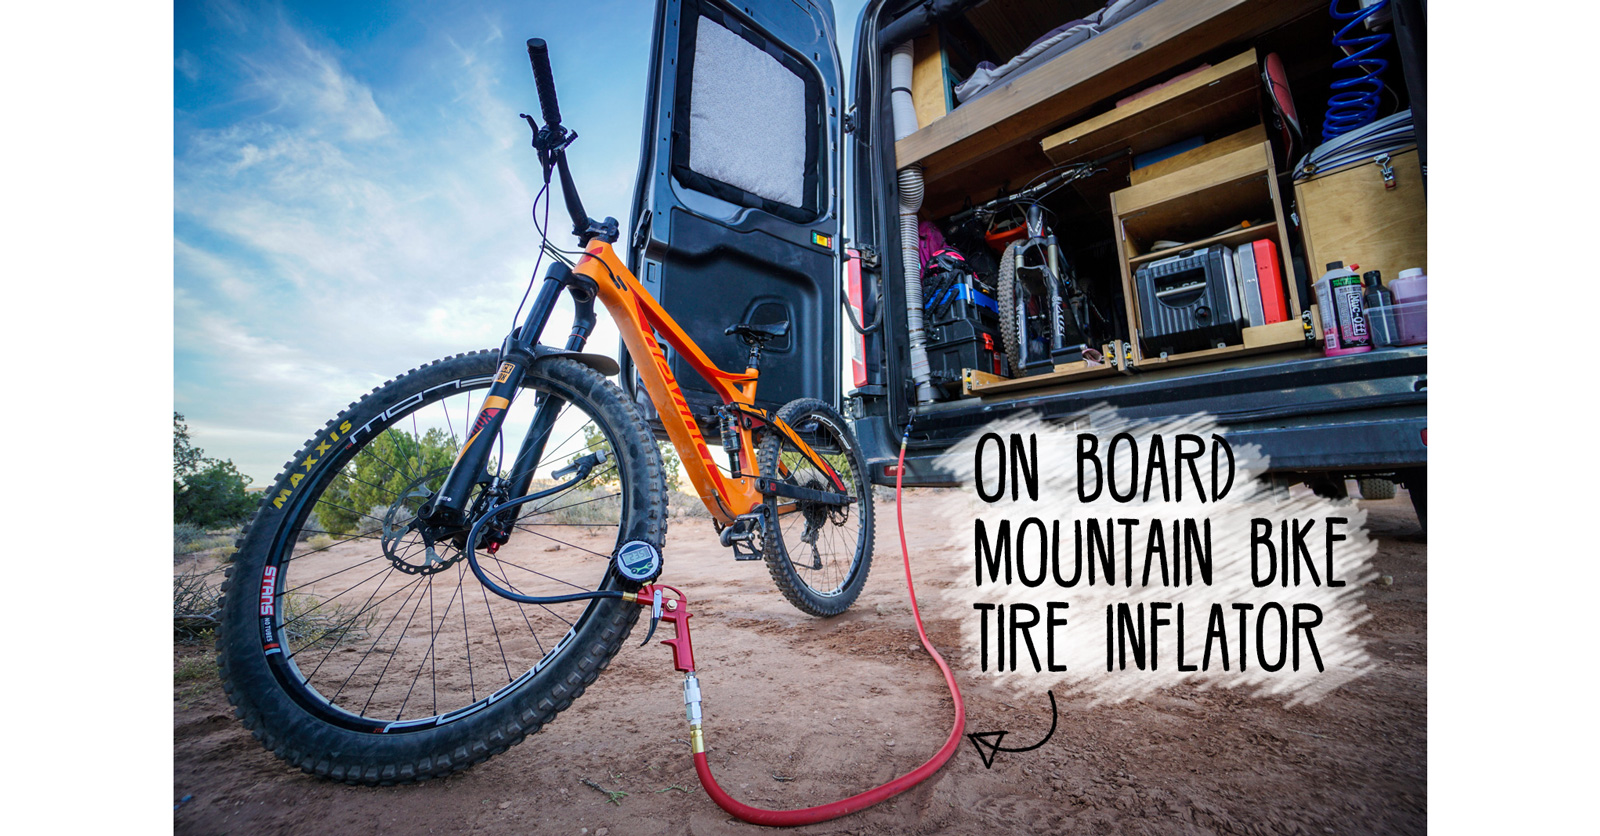 On-Board-Mountain-Bike-Tire-Inflator-Heading-(1600px)